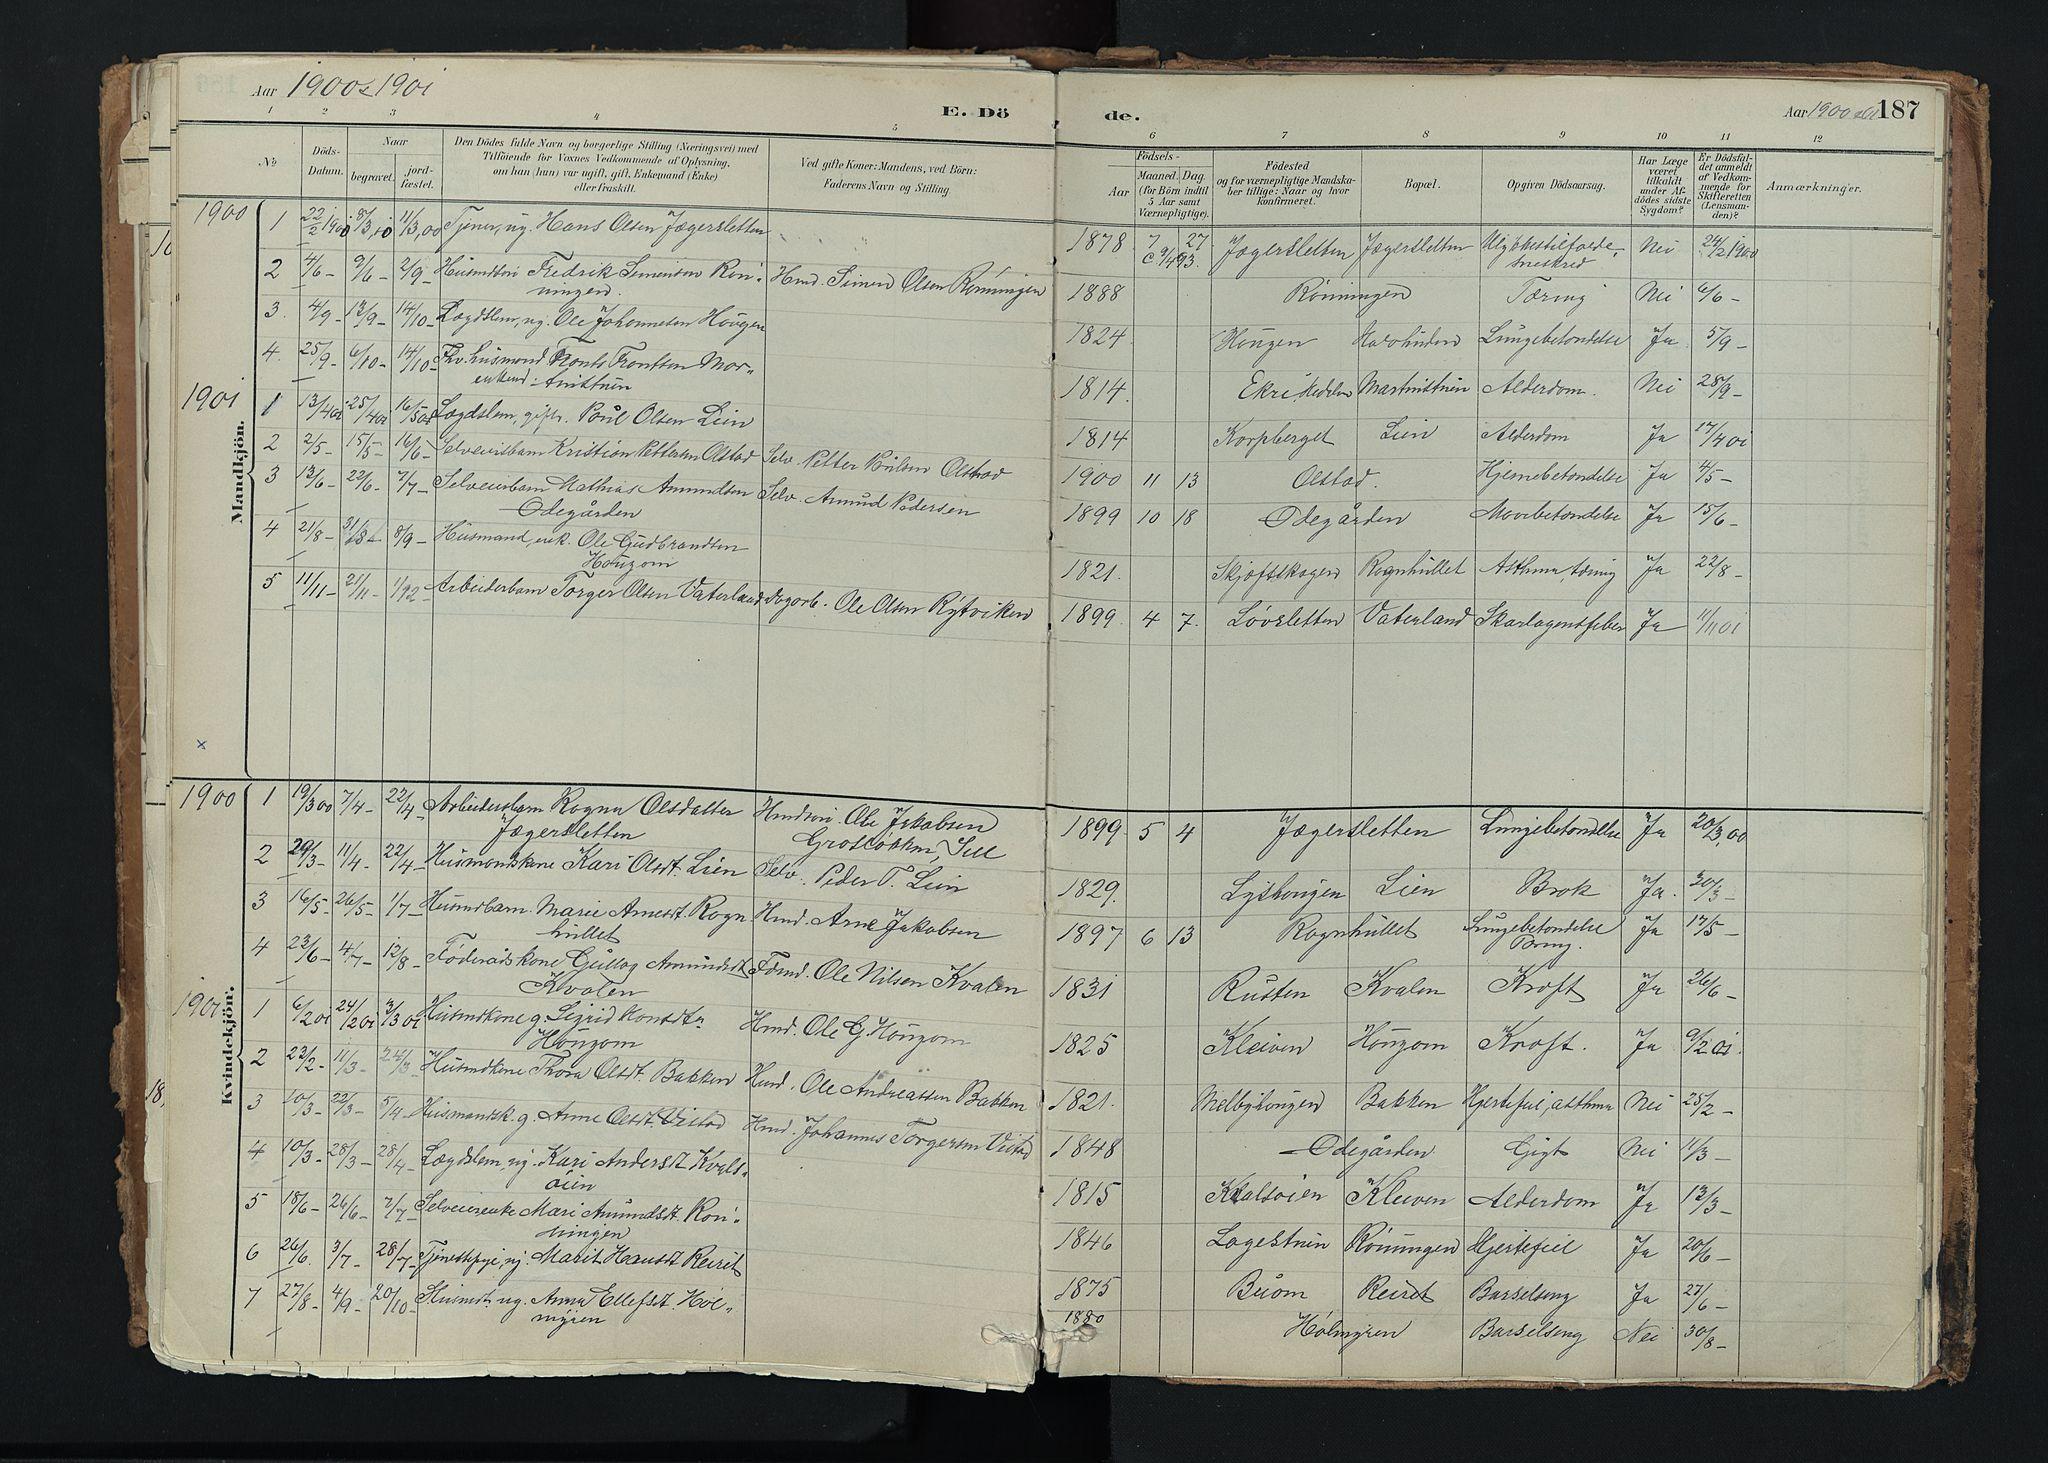 SAH, Nord-Fron prestekontor, Ministerialbok nr. 5, 1884-1914, s. 187